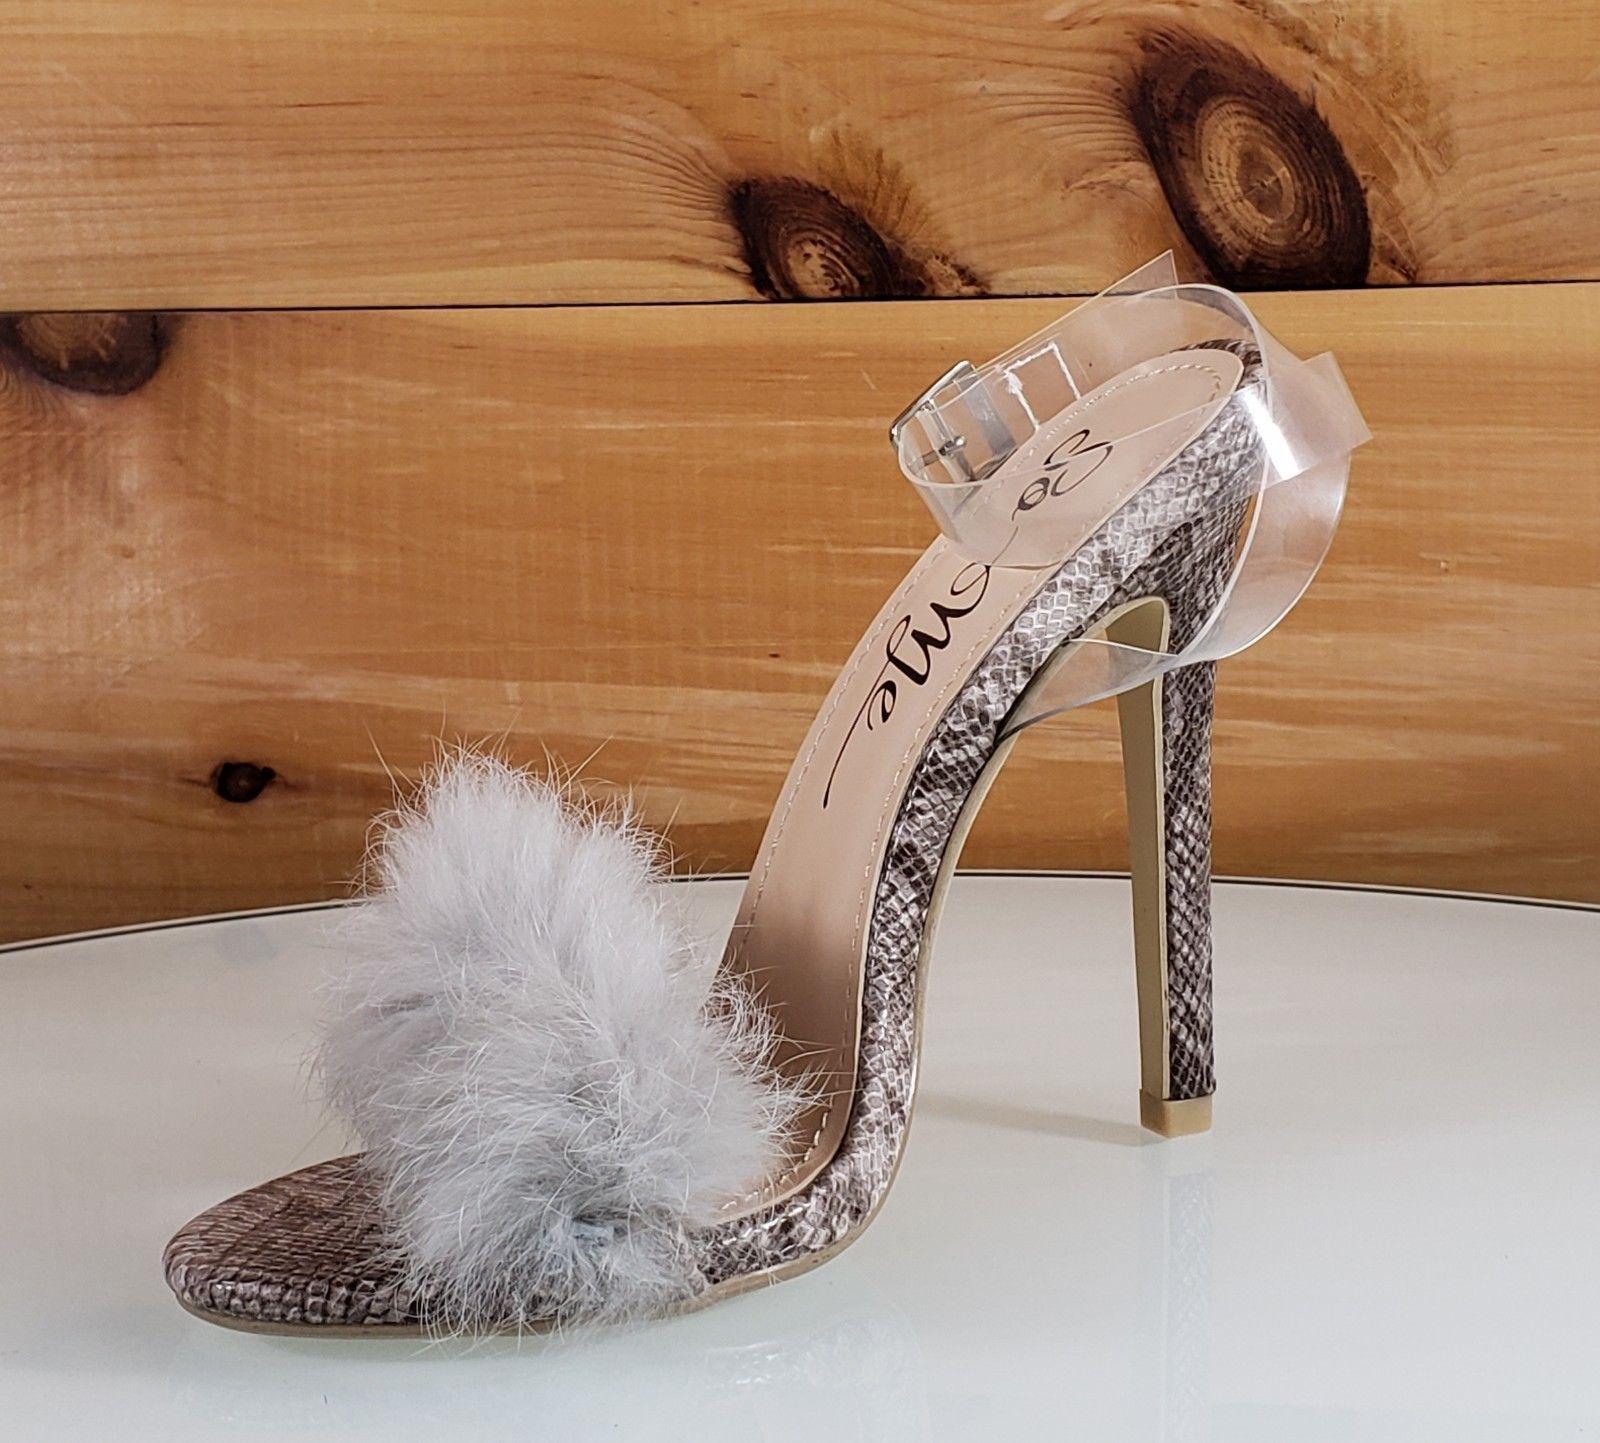 dd1fbbdb36f3 So Me Posh Fur Toe Clear Wrap Strap Marabou High Heel Shoes Snake in ...